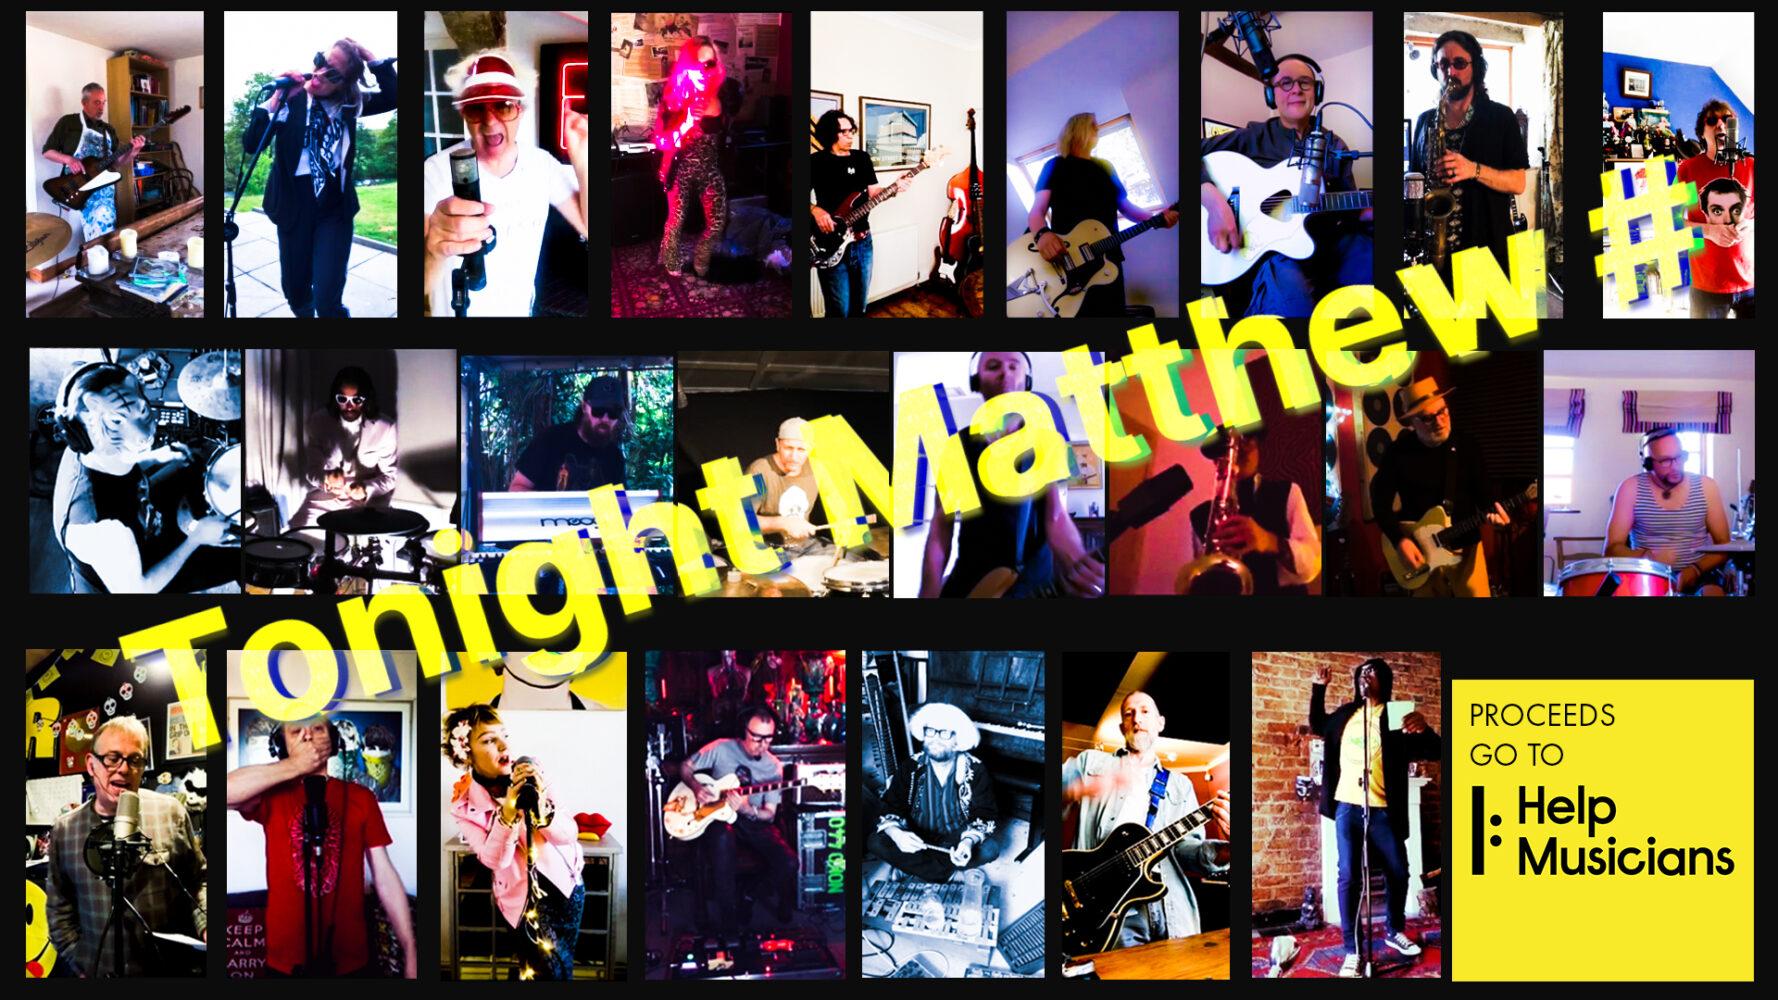 Watch this! Tonight Matthew…? 90s Indie Stars In Their Eyes Lockdown Special